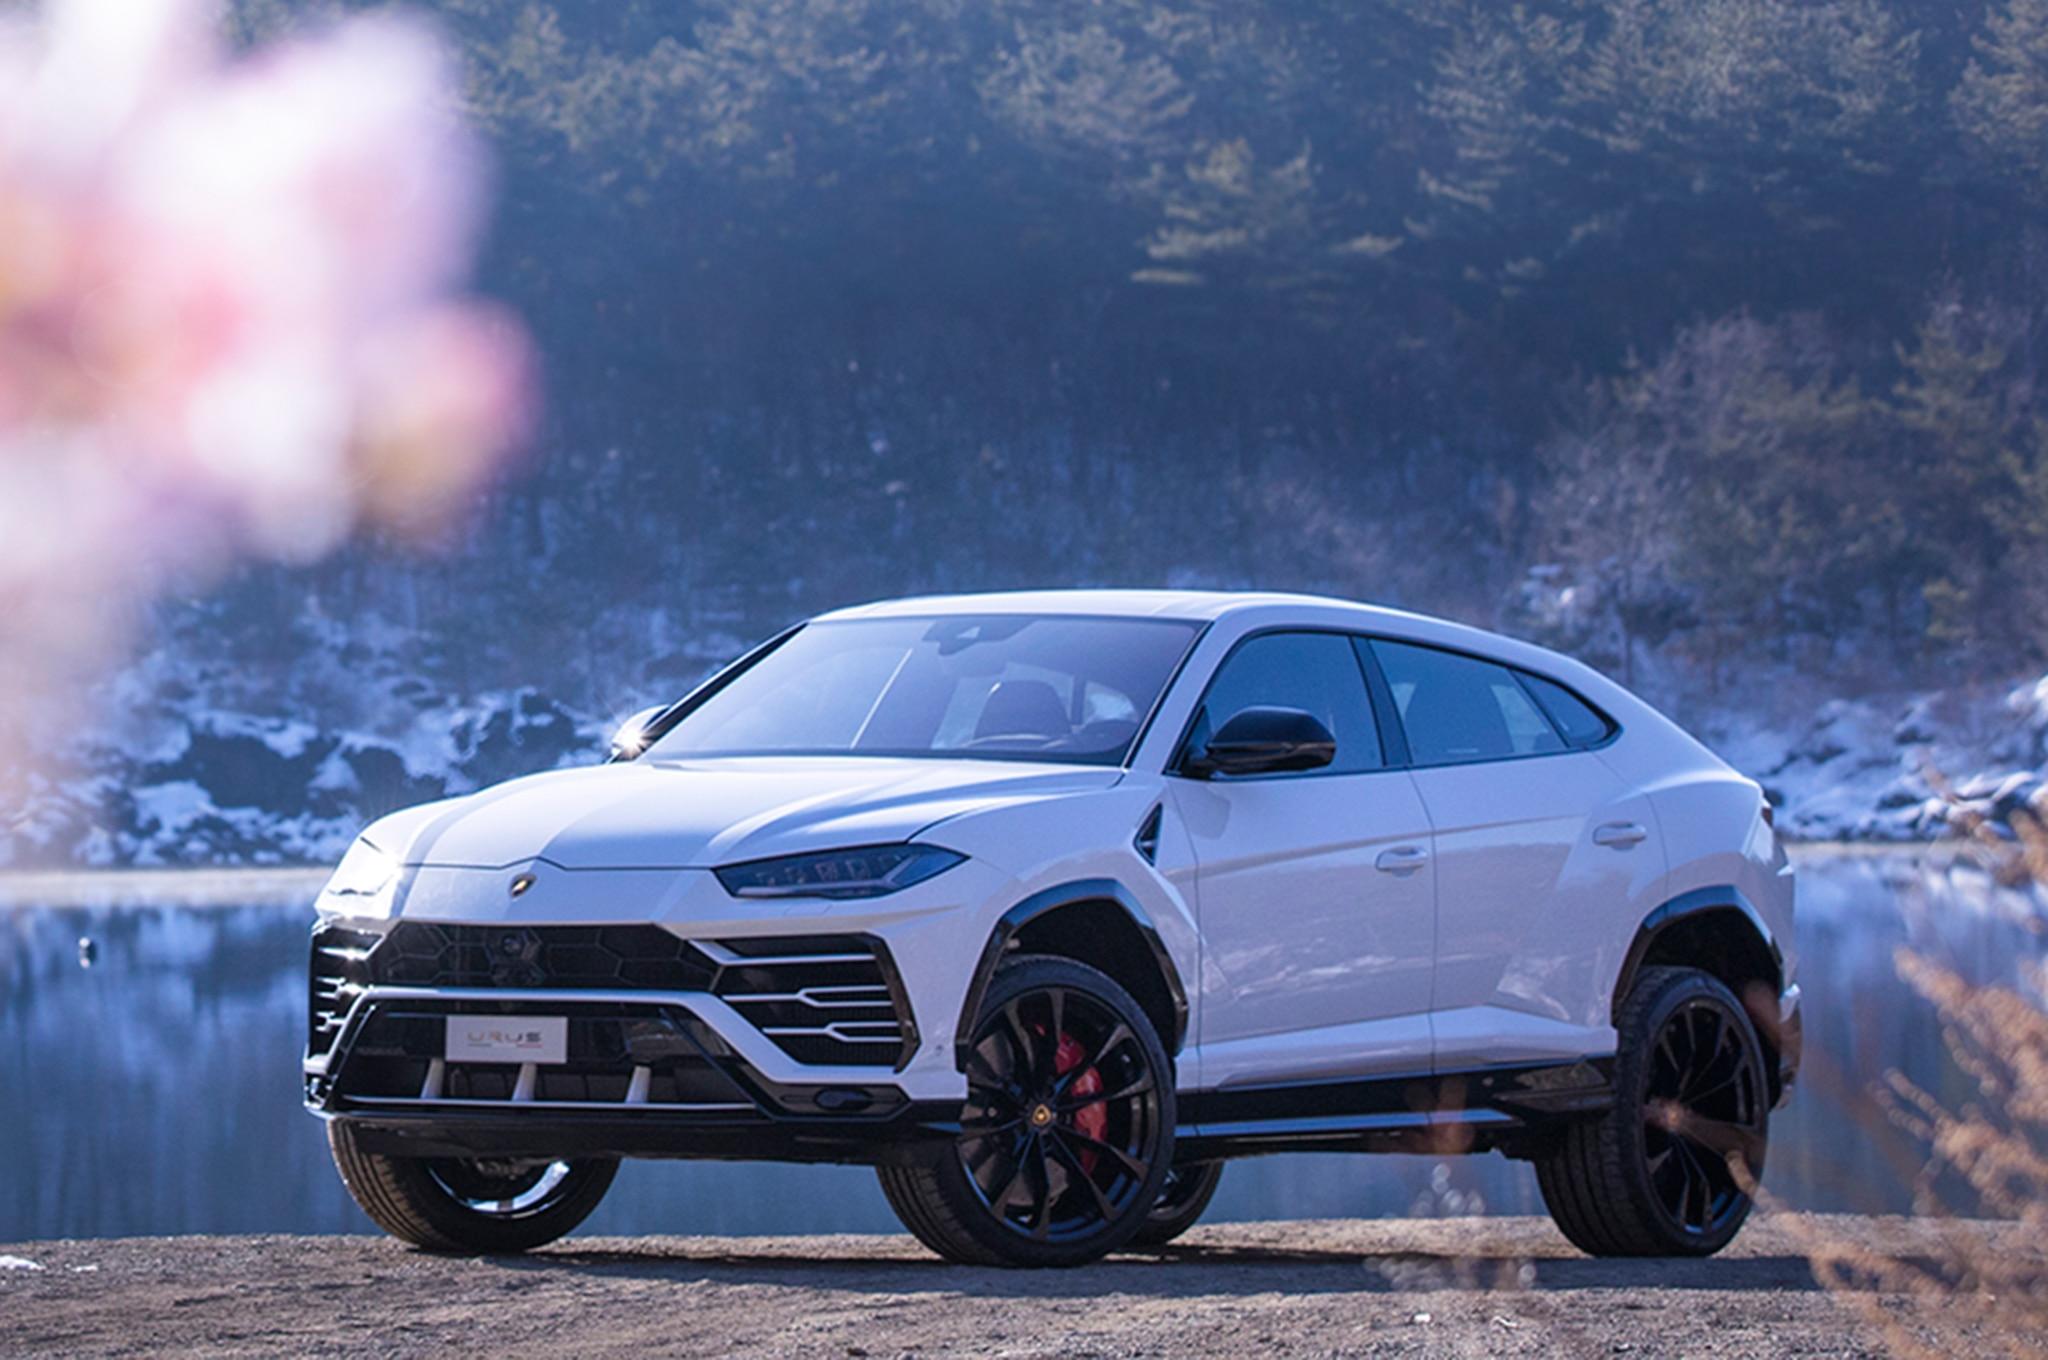 2019 Lamborghini Urus In Fuji 4 Motor Trend En Espanol